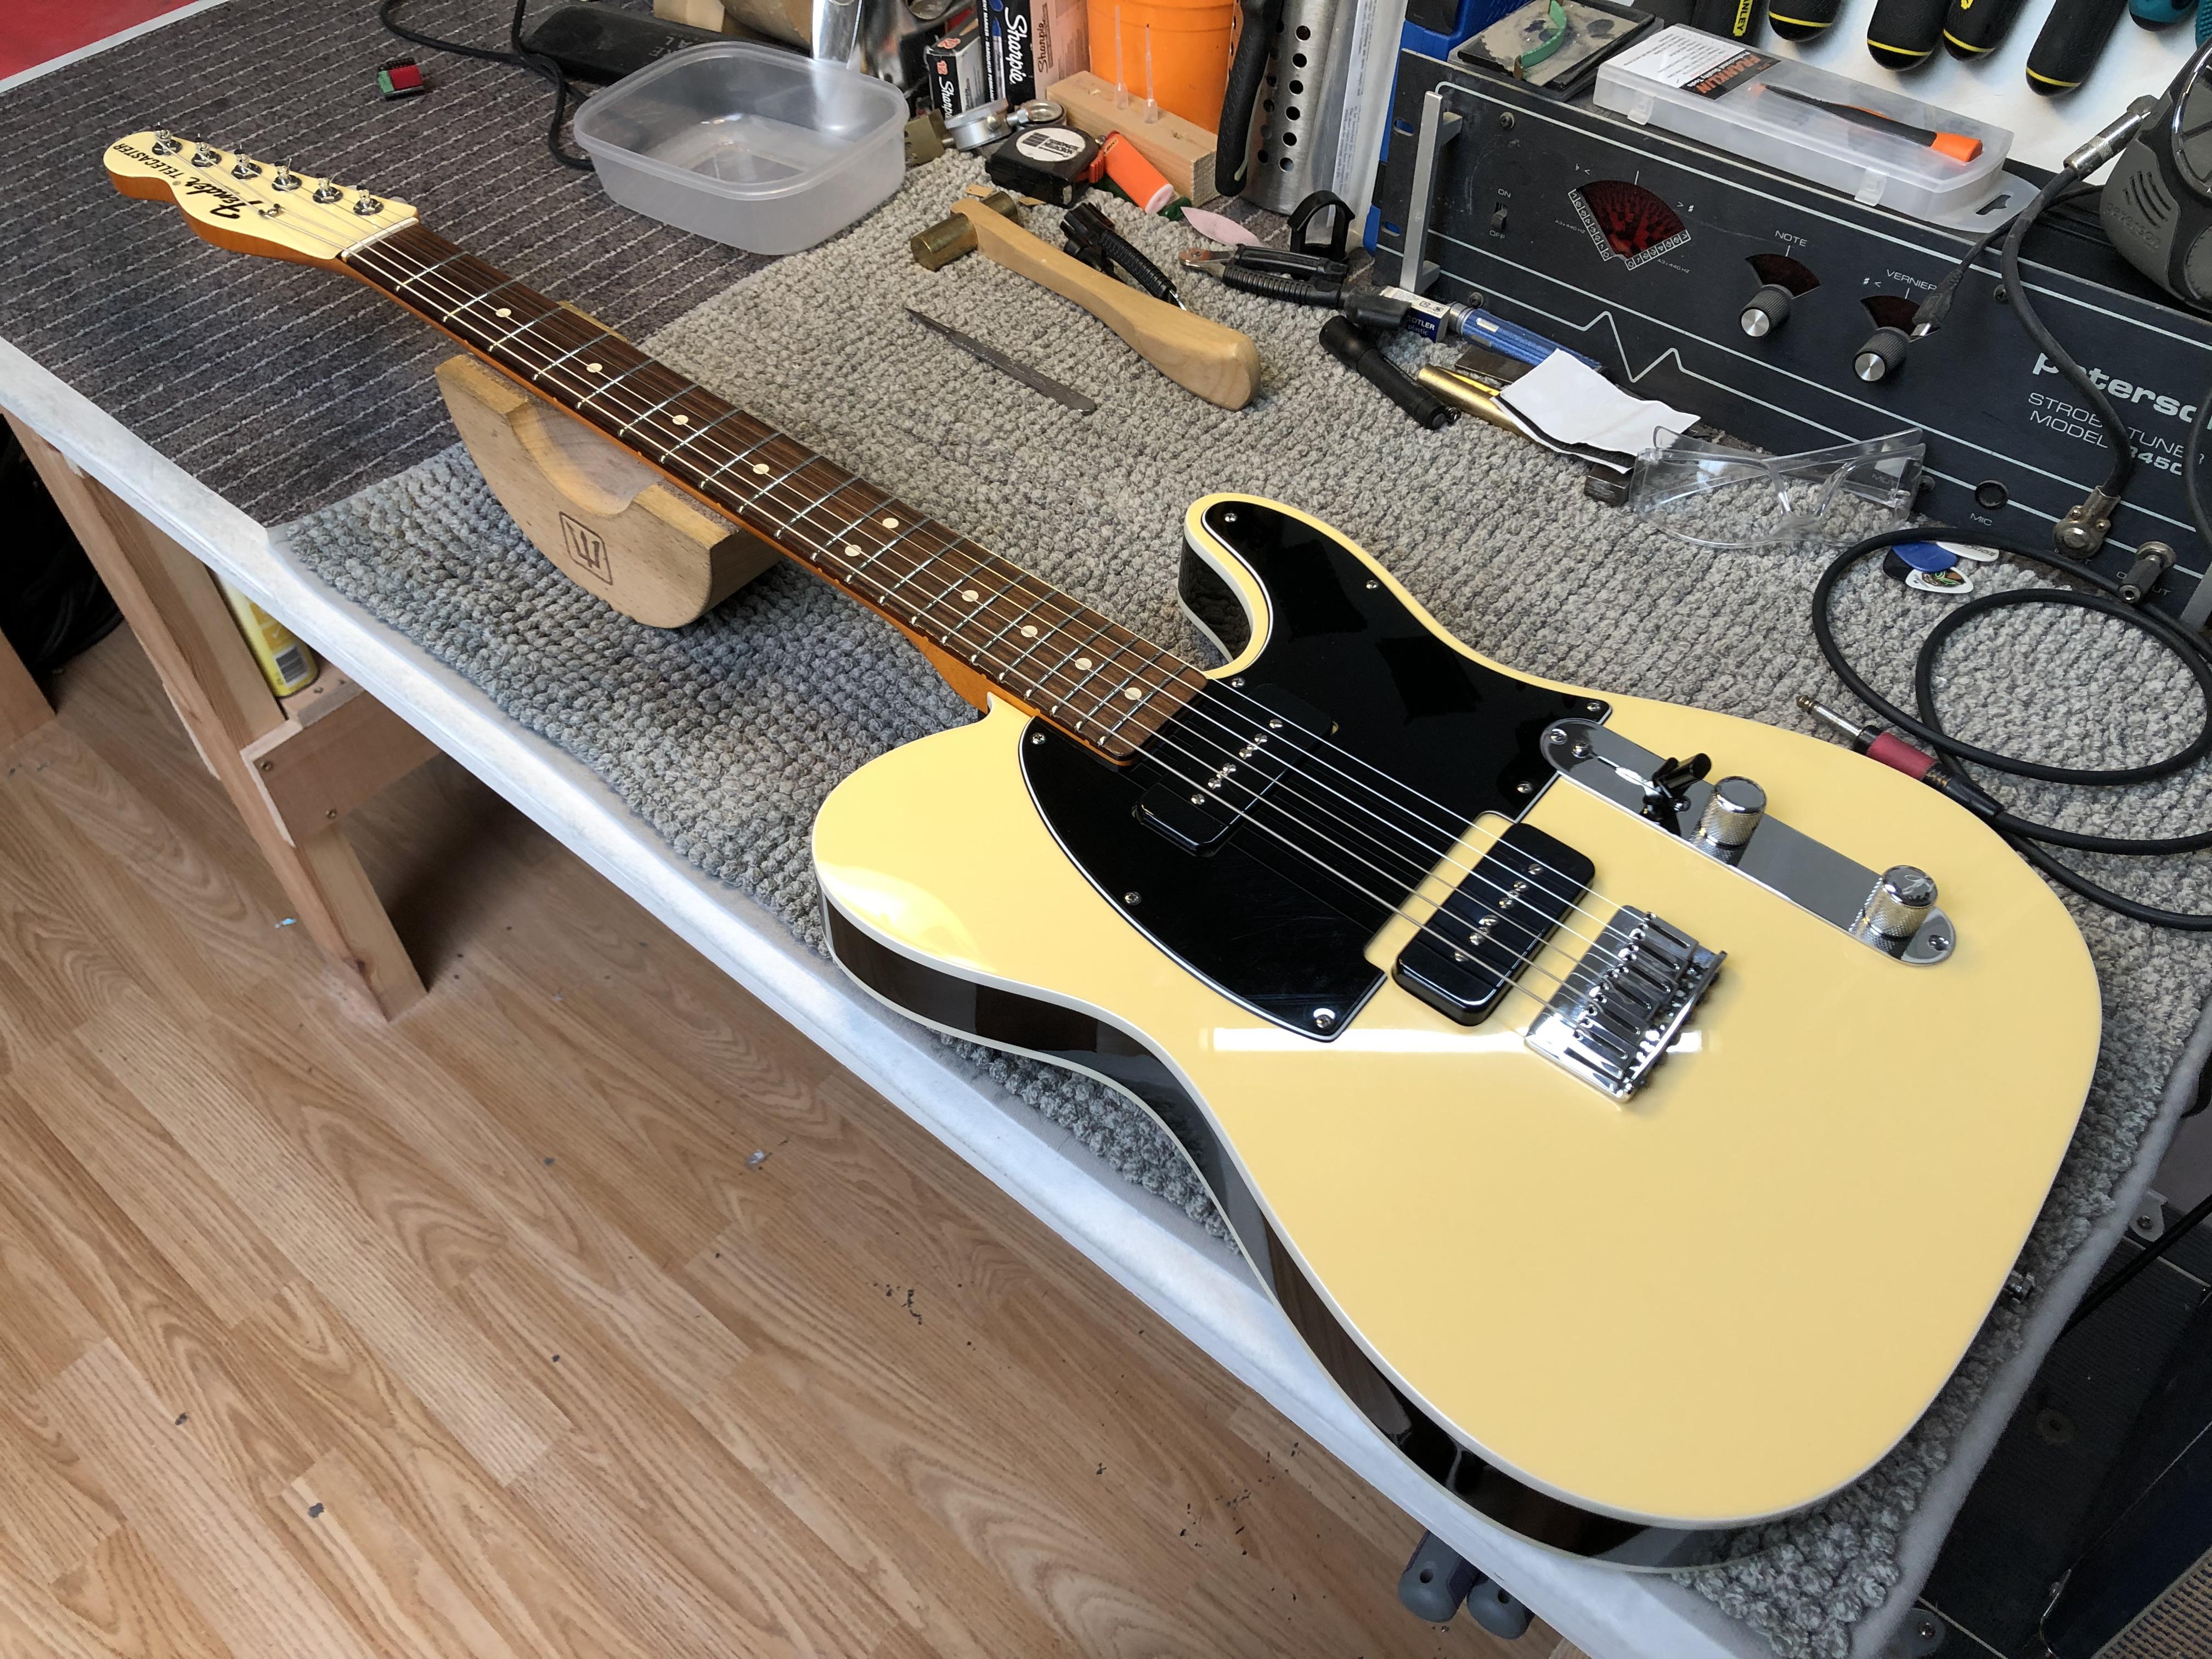 Setup on Custom Shop Fender Telecaster